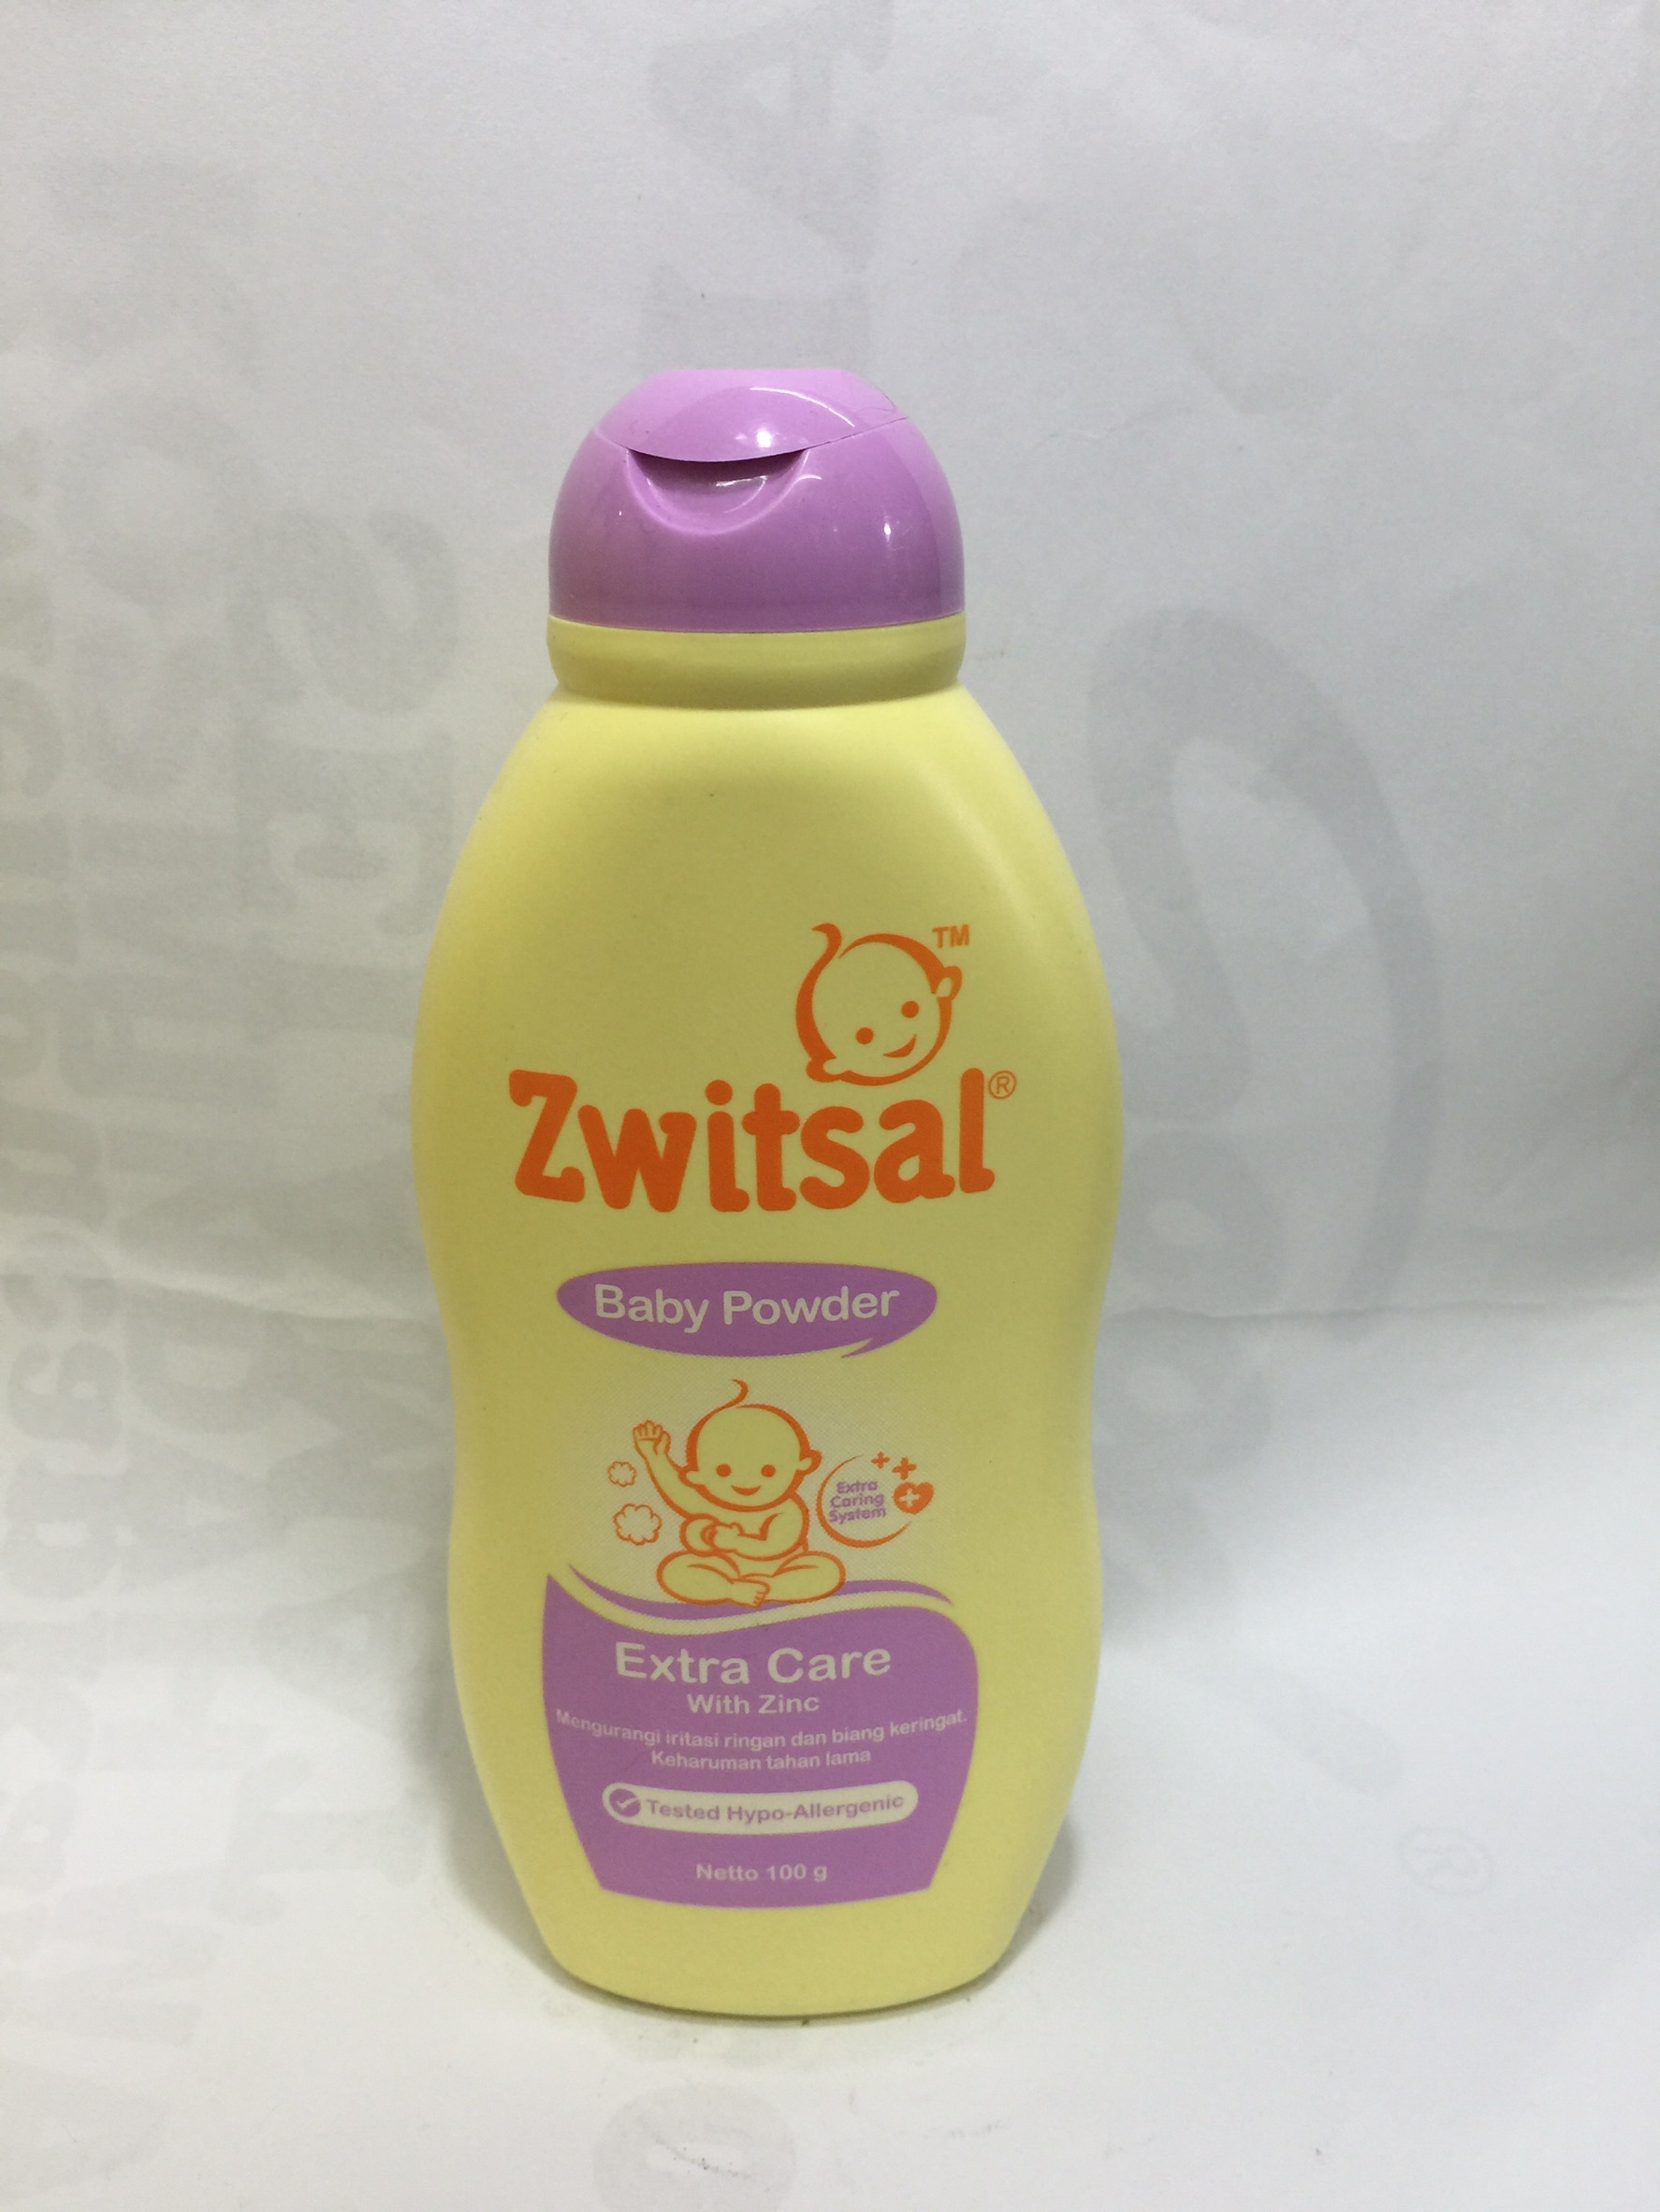 Zwitsal Baby Cream Extra Care Zinc 50ml Daftar Harga Terkini Dan With Zync Tub Powder 100